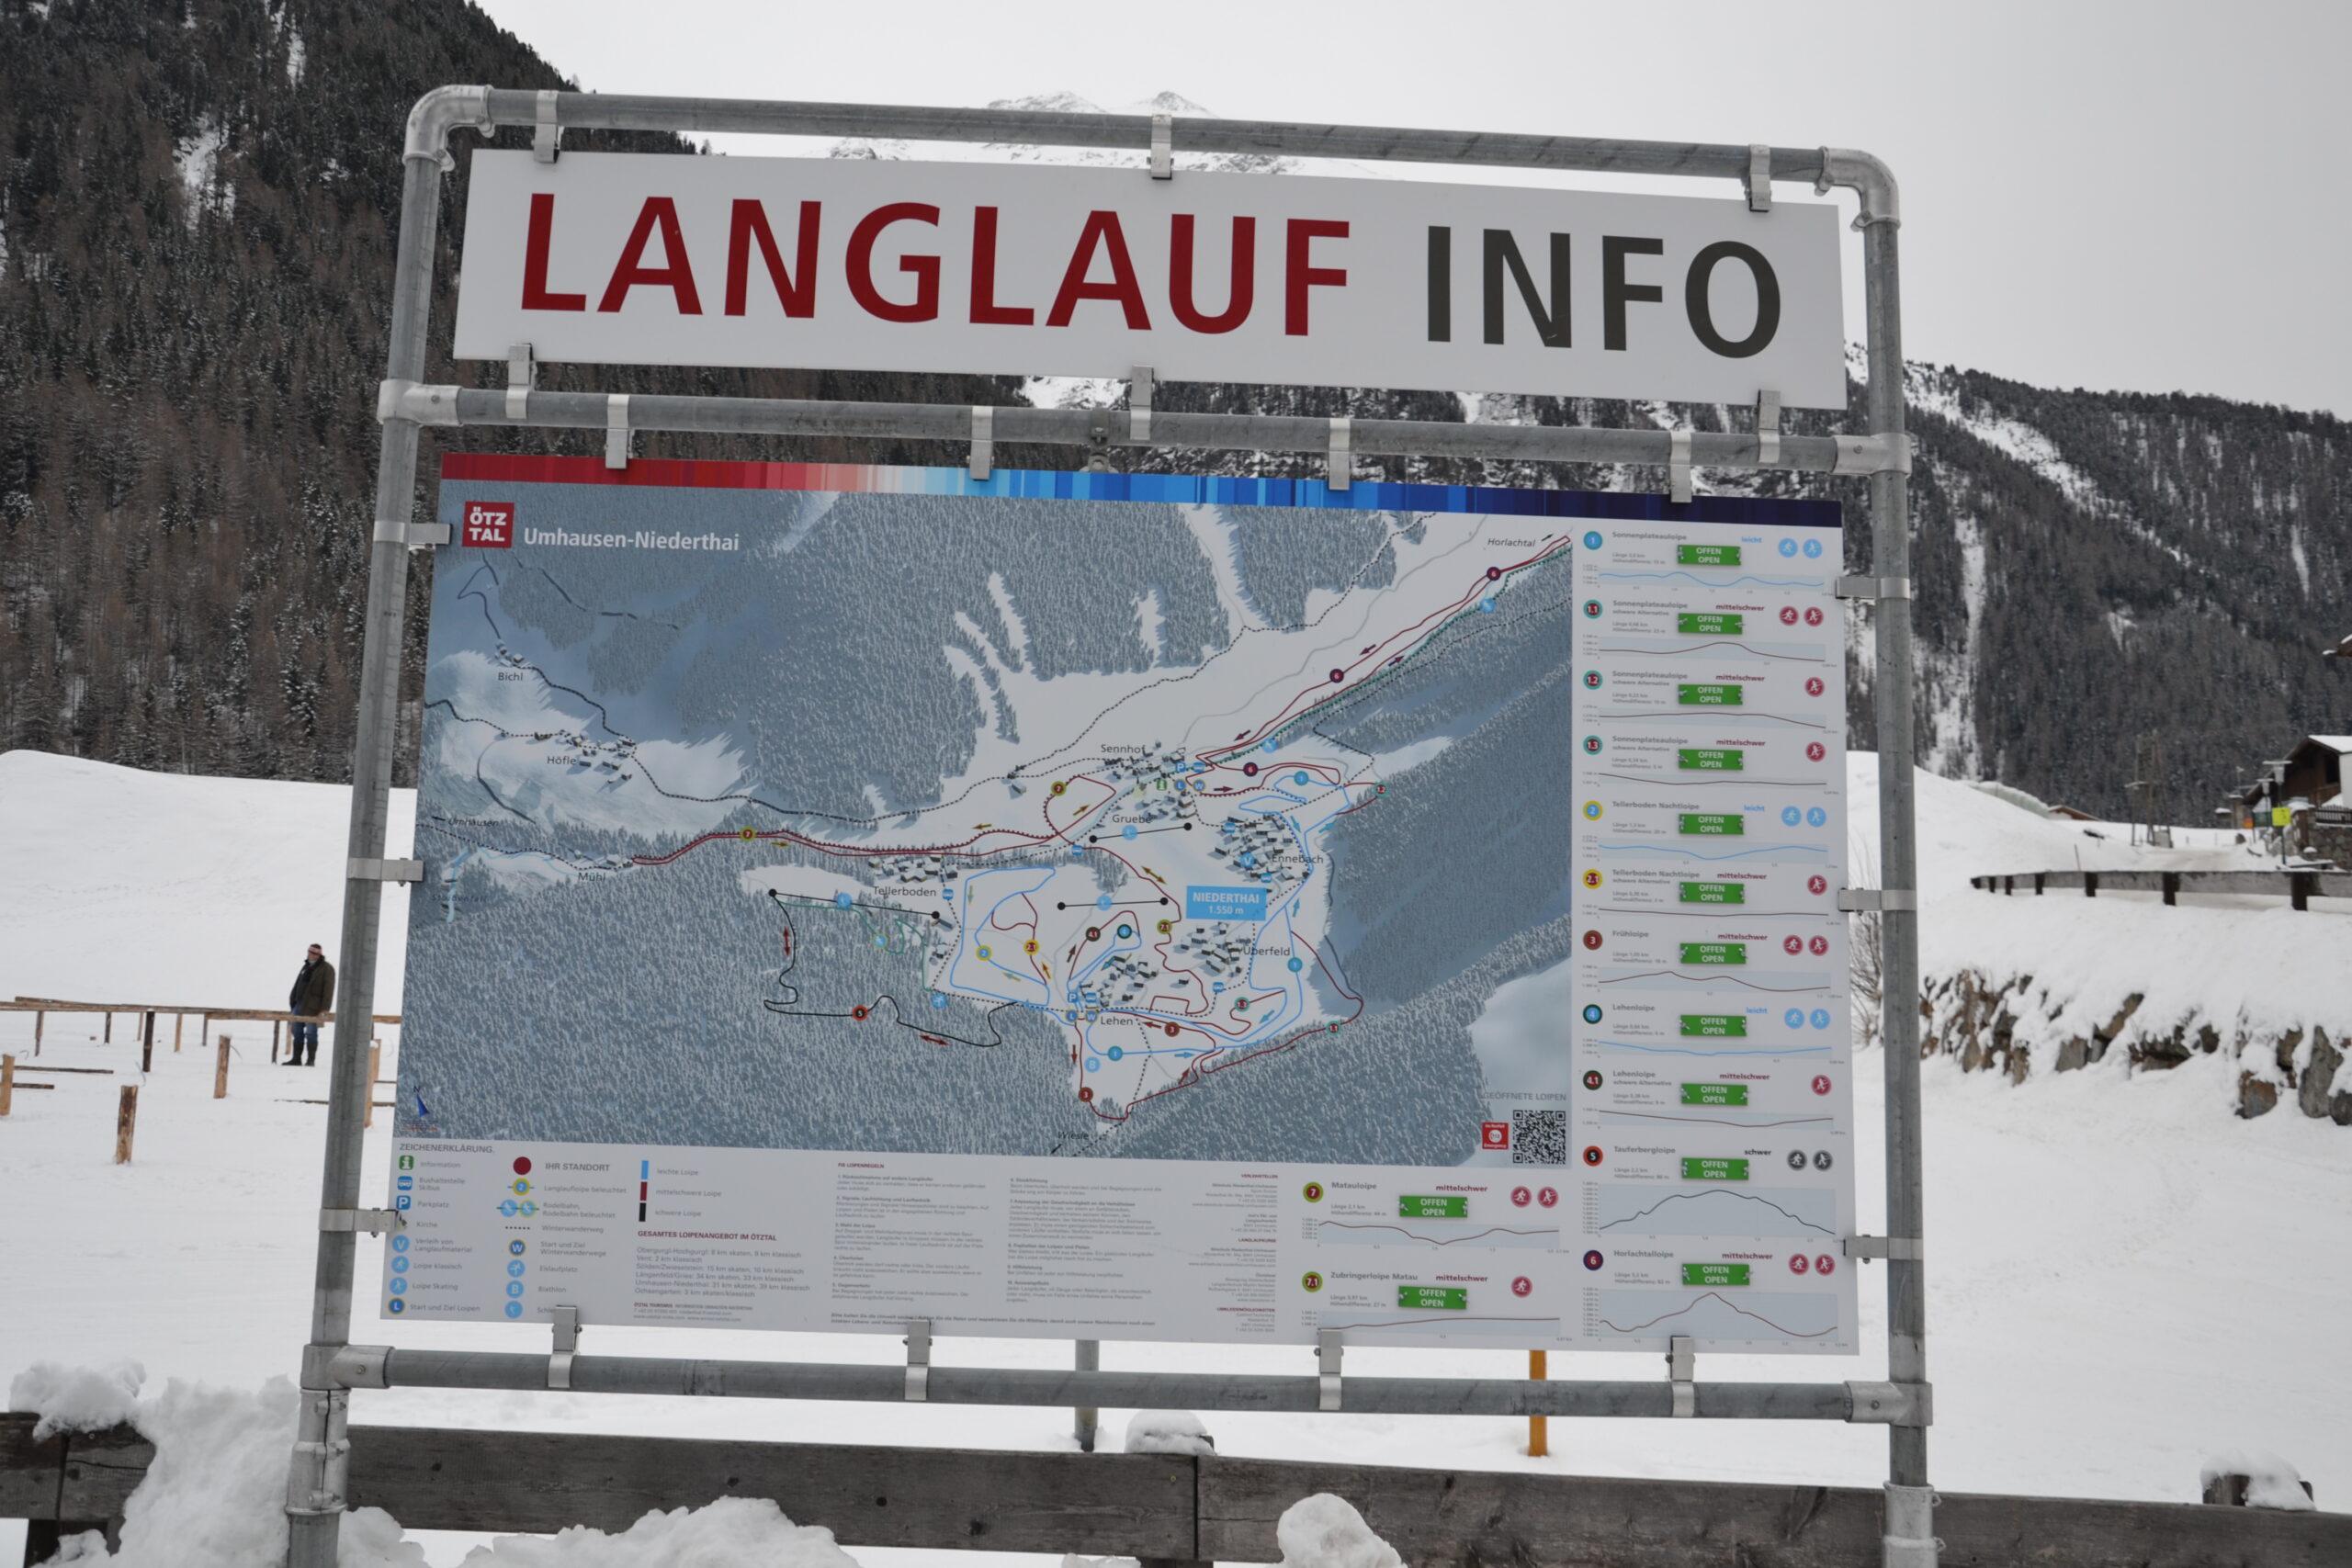 3D Panoramakarte - Panoramatafel Langlaufen Umhausen Niederthai